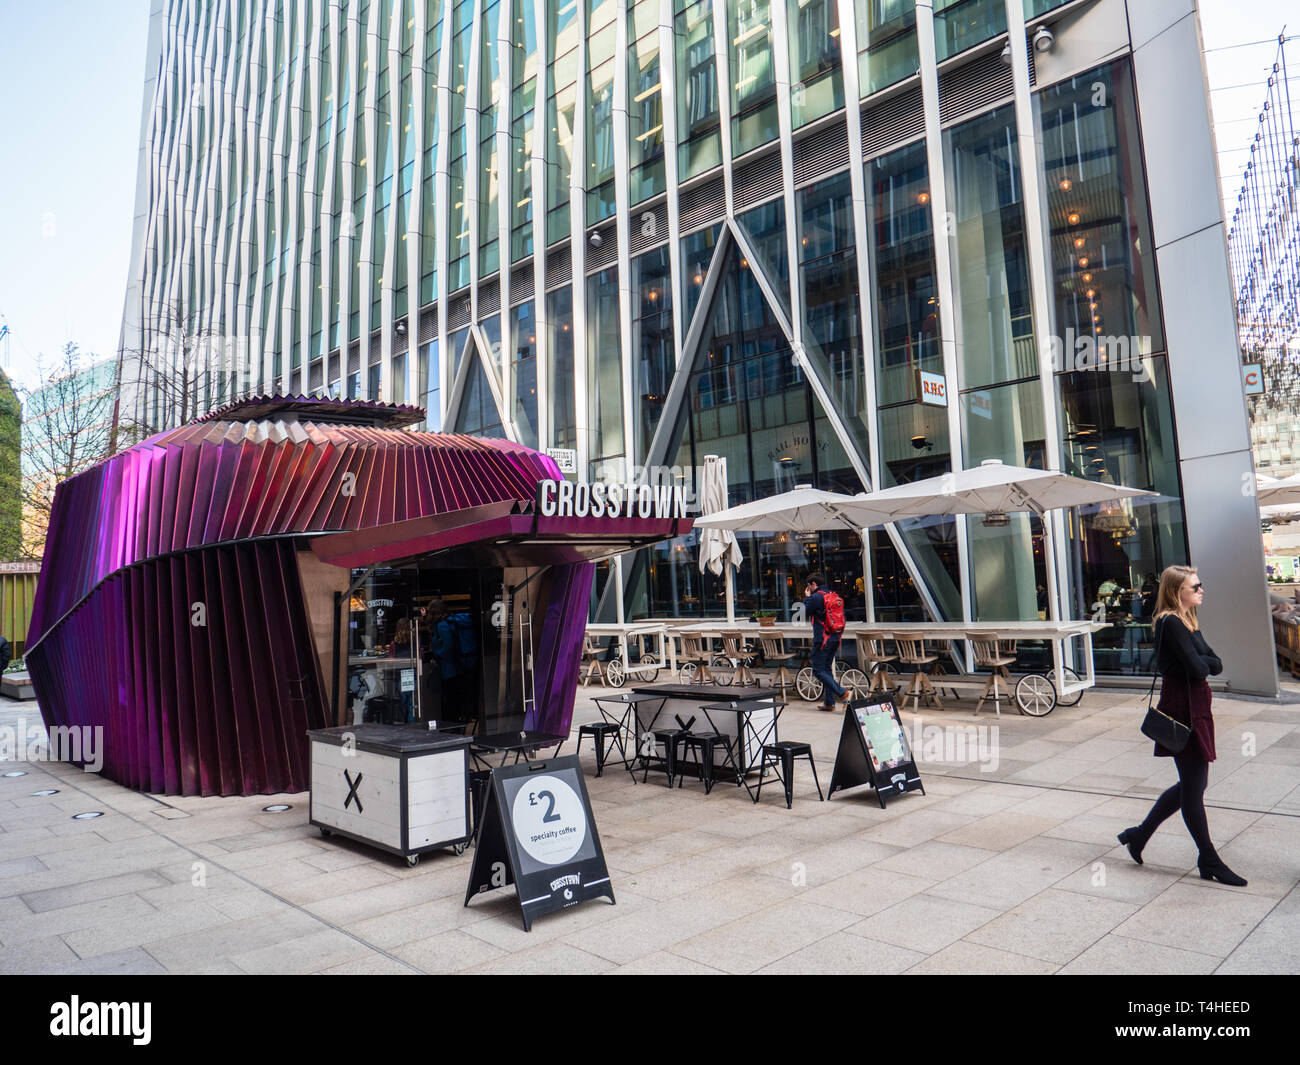 Cross Town, Luxury Doughnuts, Nova Development, Victoria, London, England, UK, GB. - Stock Image